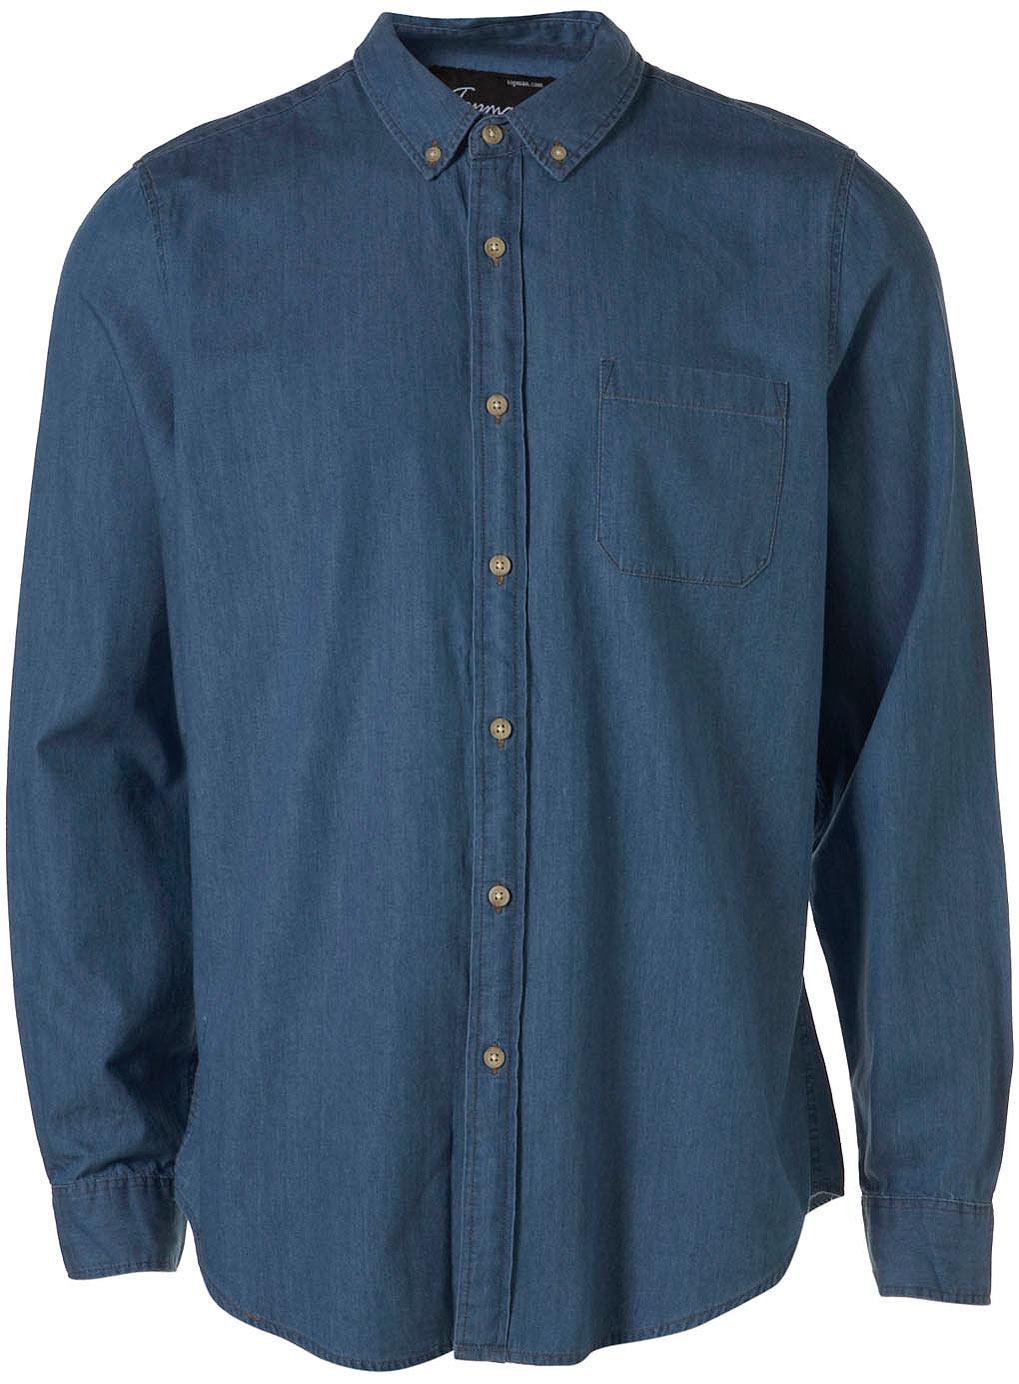 Long denim button down collar shirt in blue for men denim for Denim button down shirts